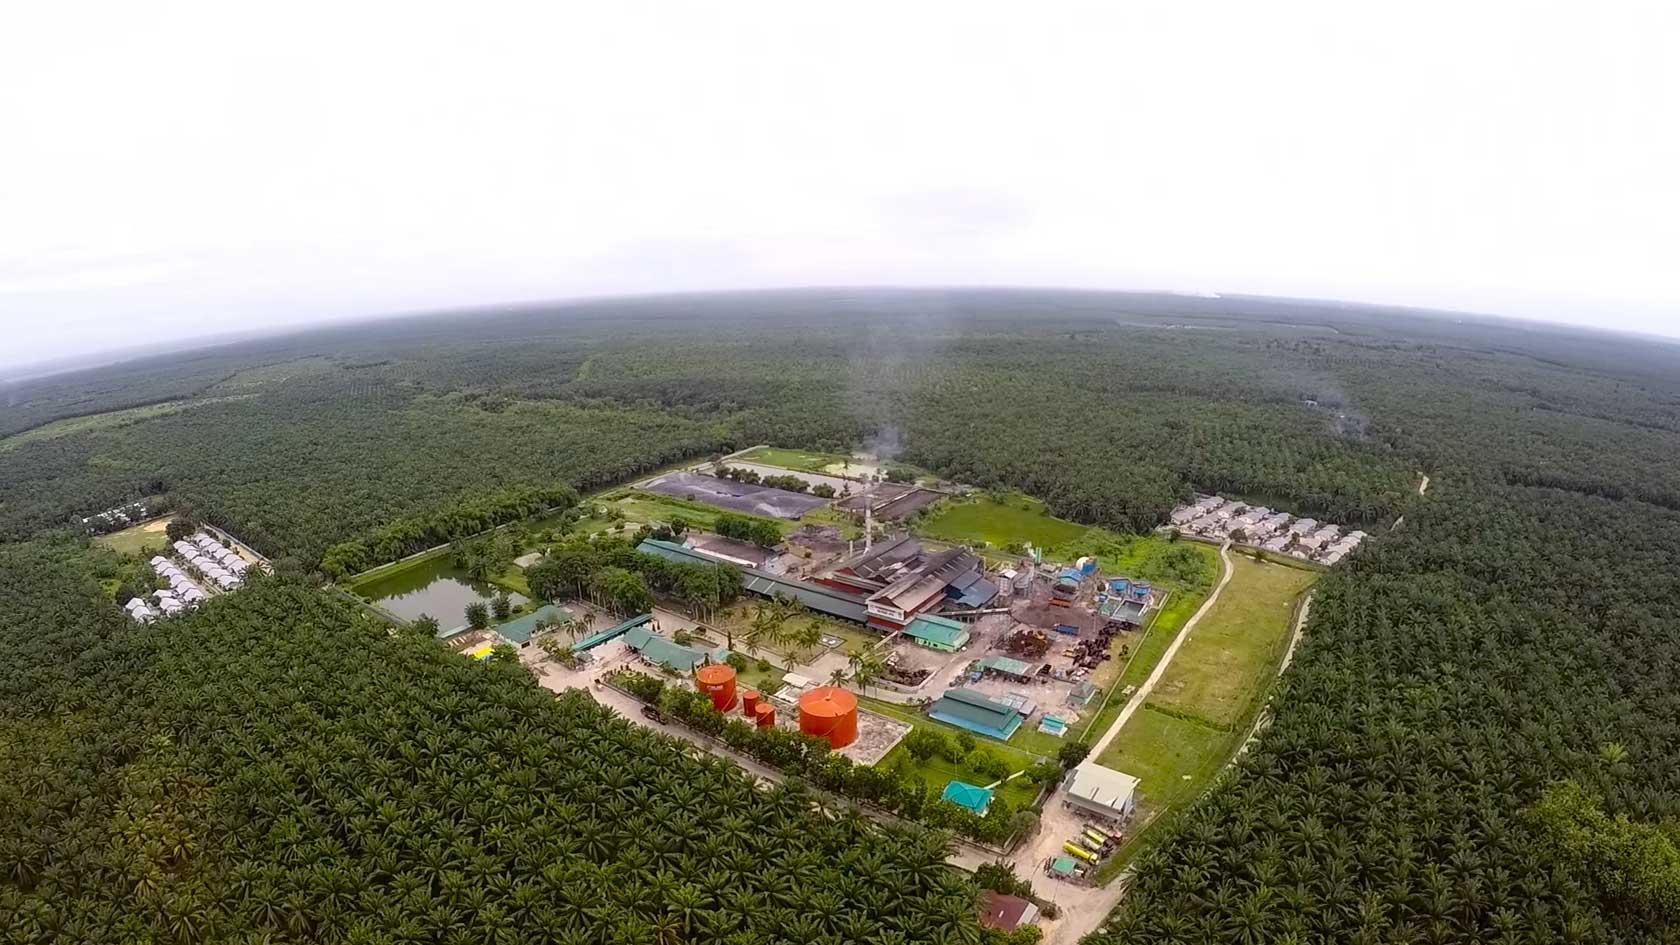 Vue aérienne de l'usine d'huile de palme Perkenunan Milano appartenant à Wilmar International